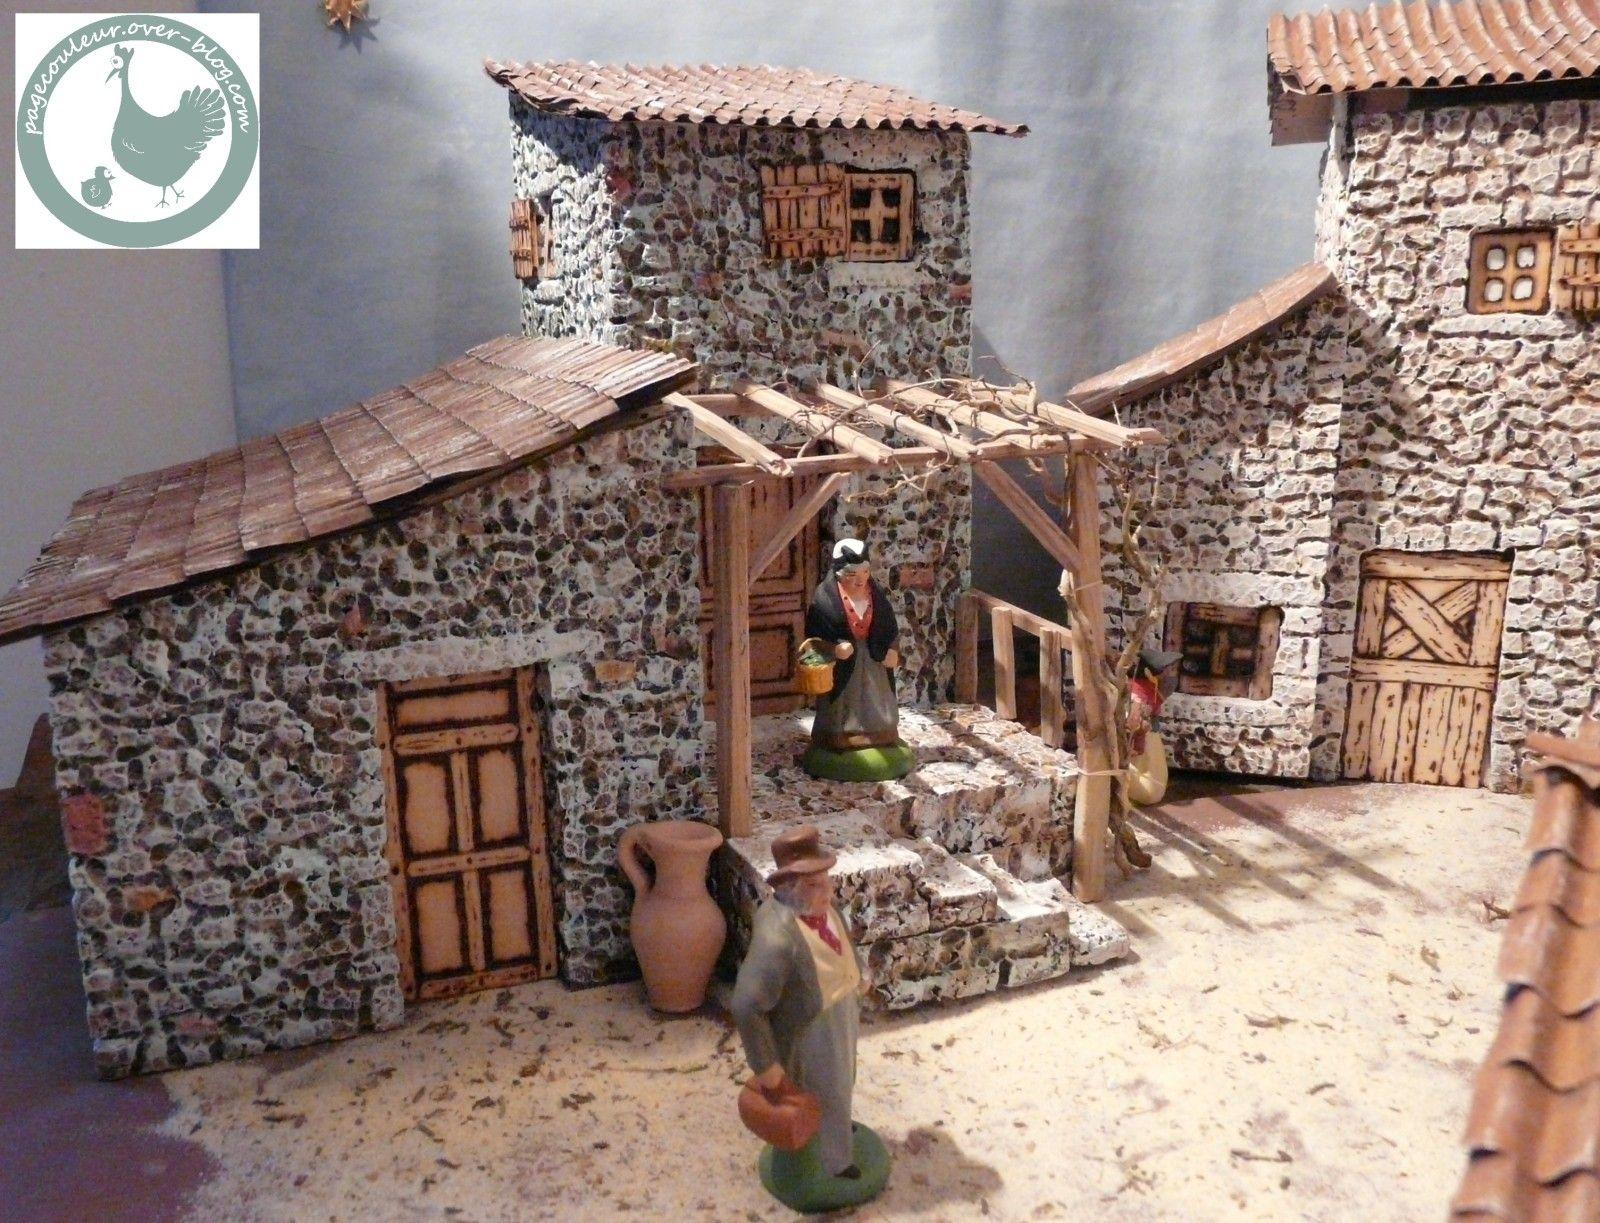 fabrication de maison pour creche de noel ventana blog